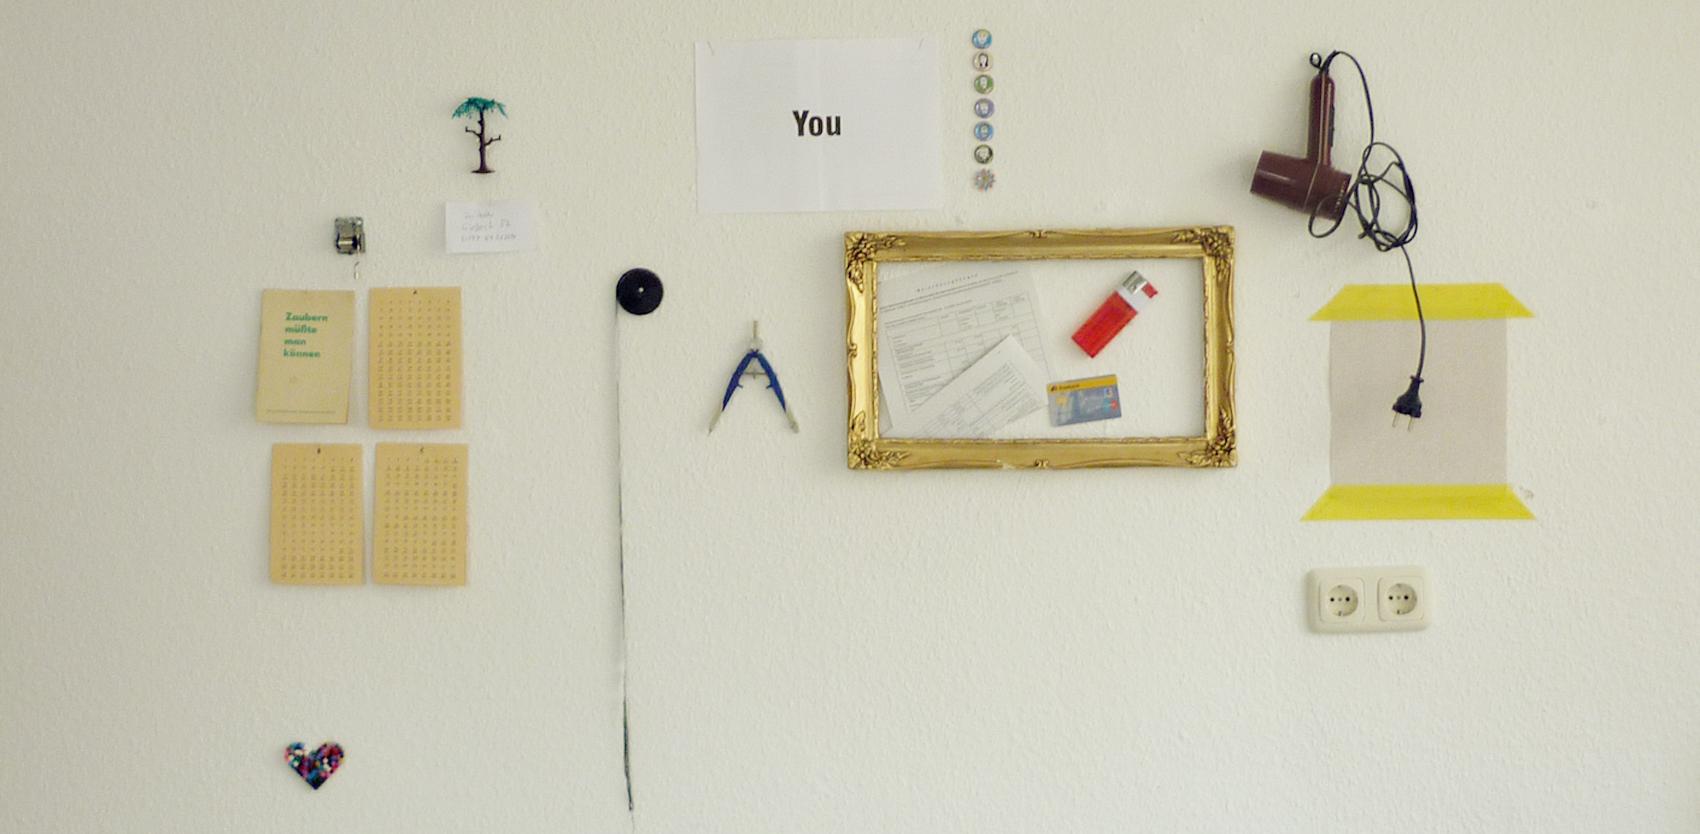 Wand mit seltsamen Gegenständen in Petersburger Hängung